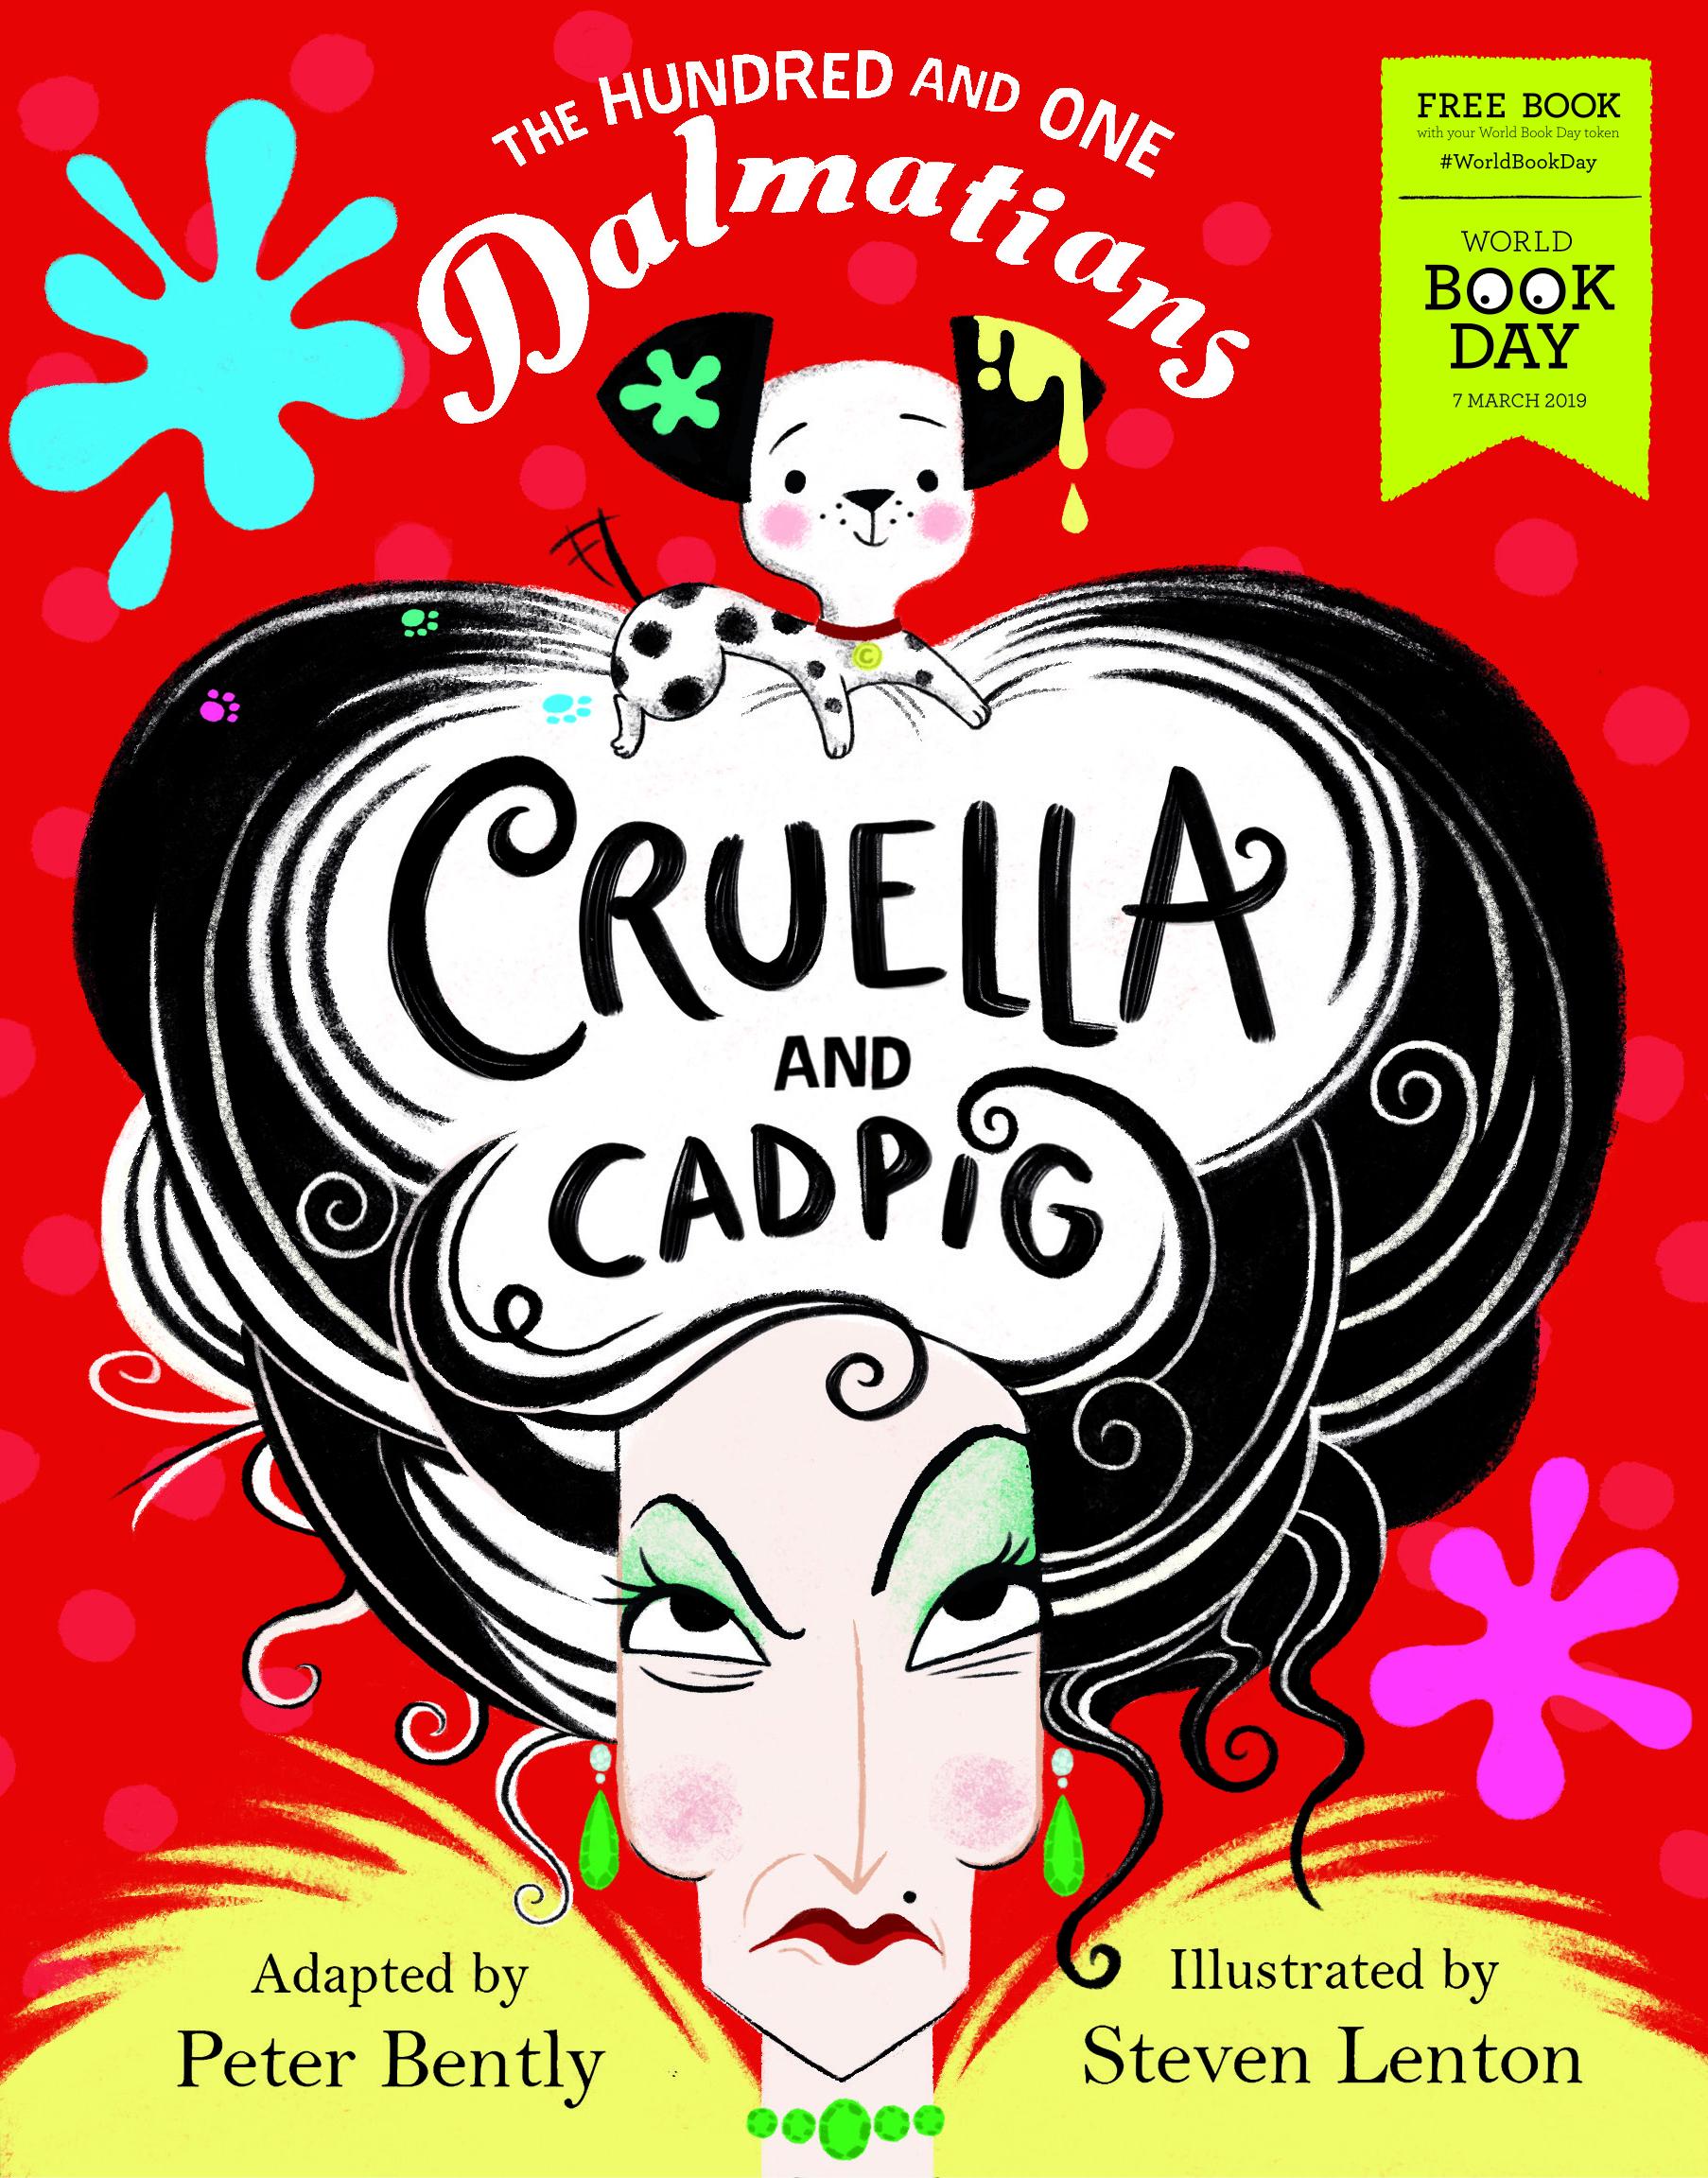 Cruella & Cadpig- Jacket.jpg